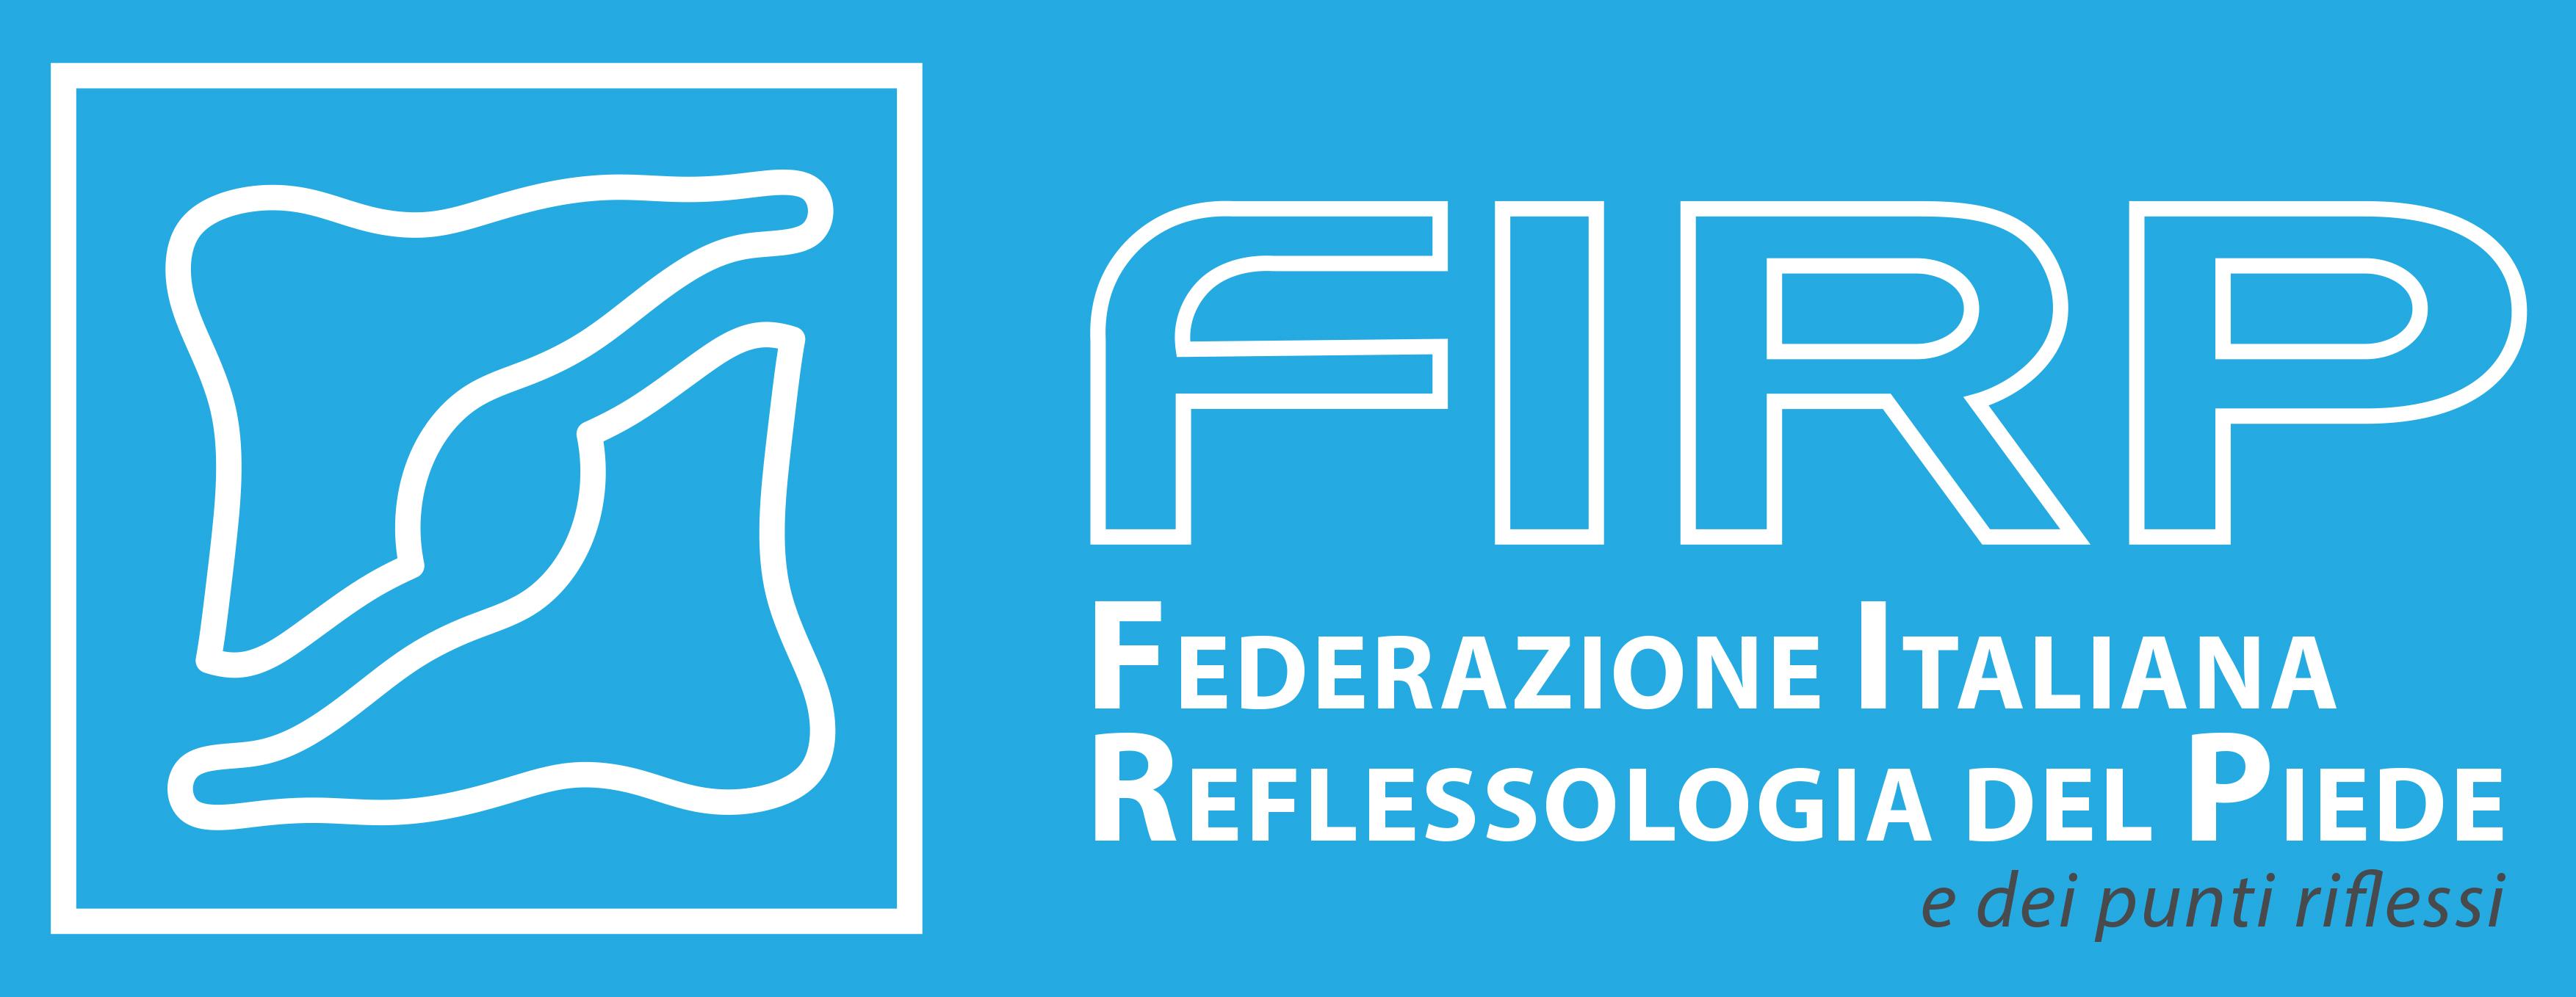 Logo firp ribattuto_sfondo ciano.jpg